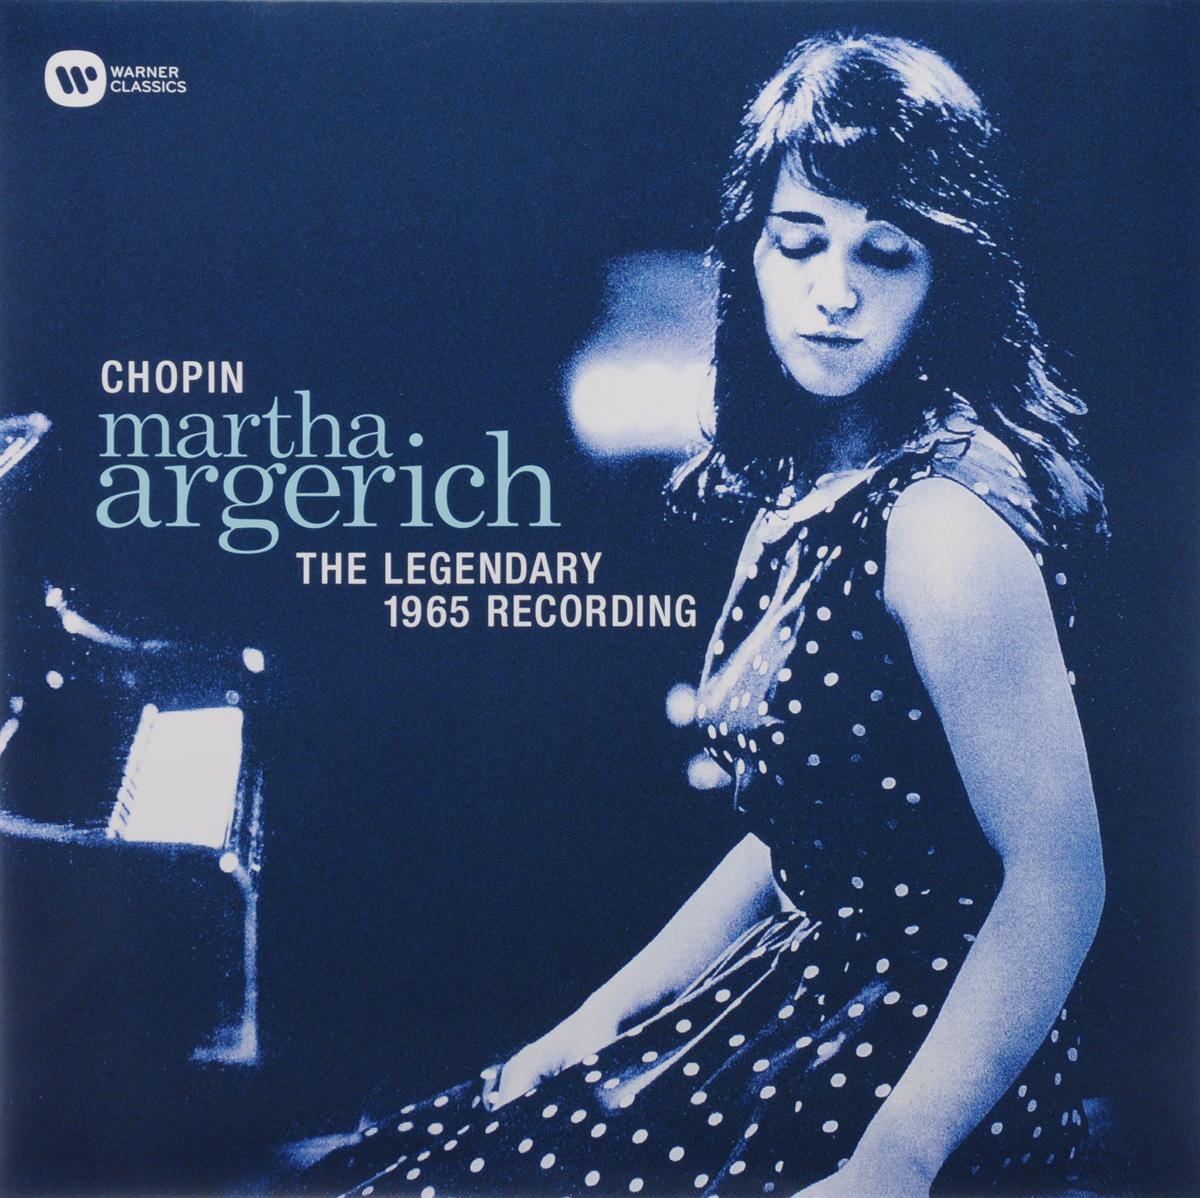 Марта Аргерих Martha Argerich. Chopin - The Legendary 1965 Recording (LP) миша майский марта аргерих mischa maisky martha argerich in concert